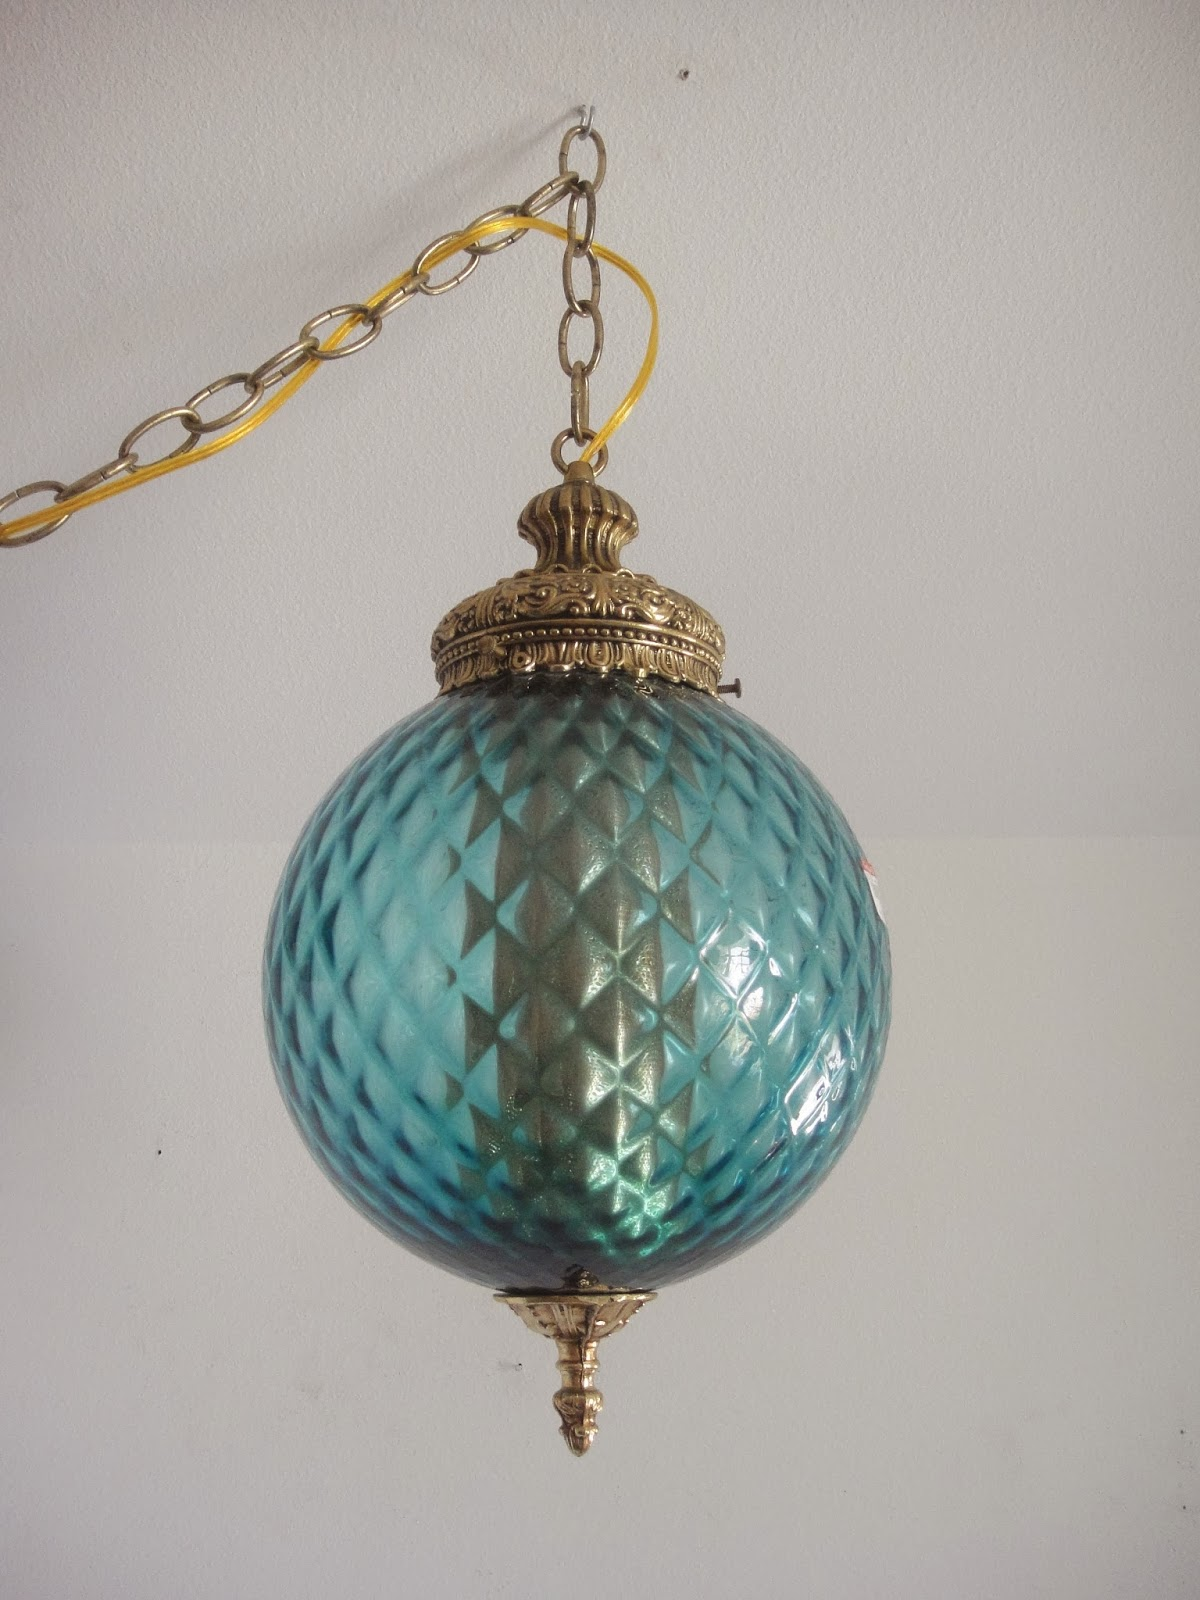 Rain Lamps